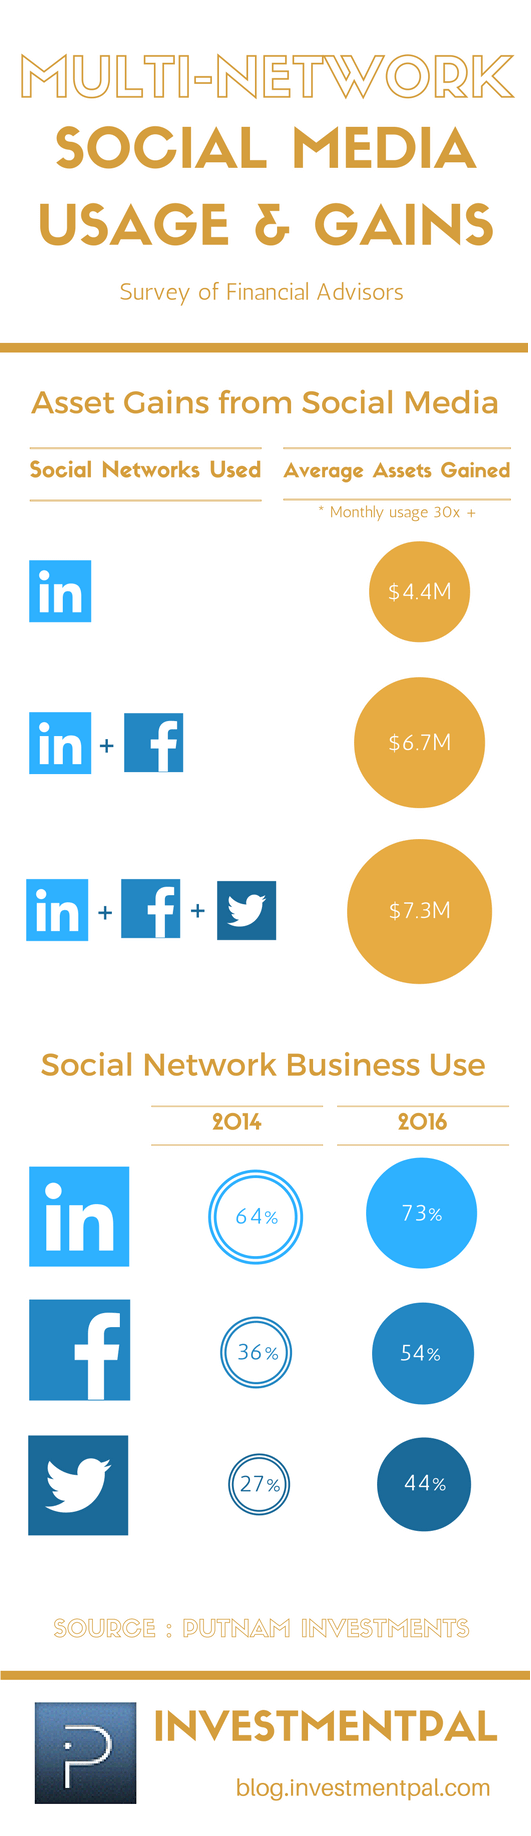 Financial advisors twitter linkedin facebook gains